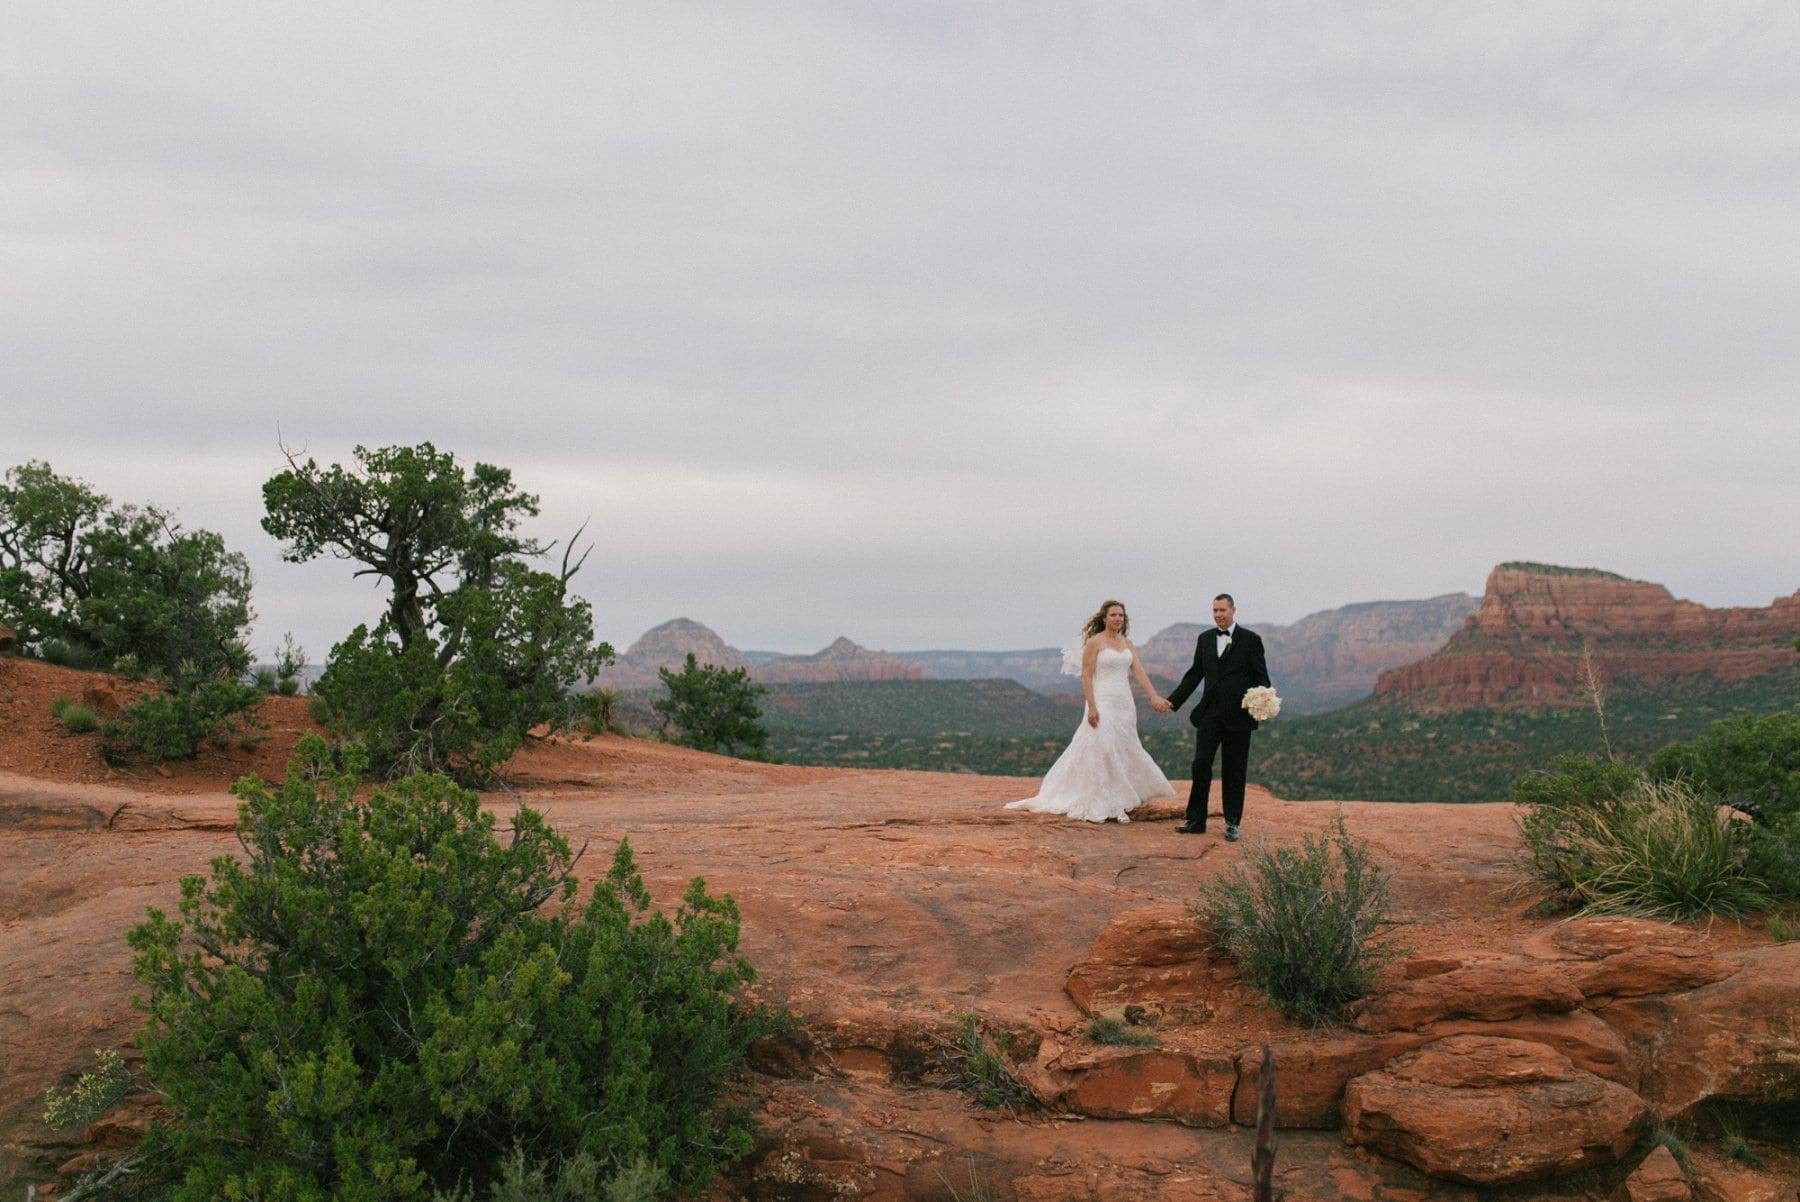 Sedona wedding photos at Yavapai Lookout Trail